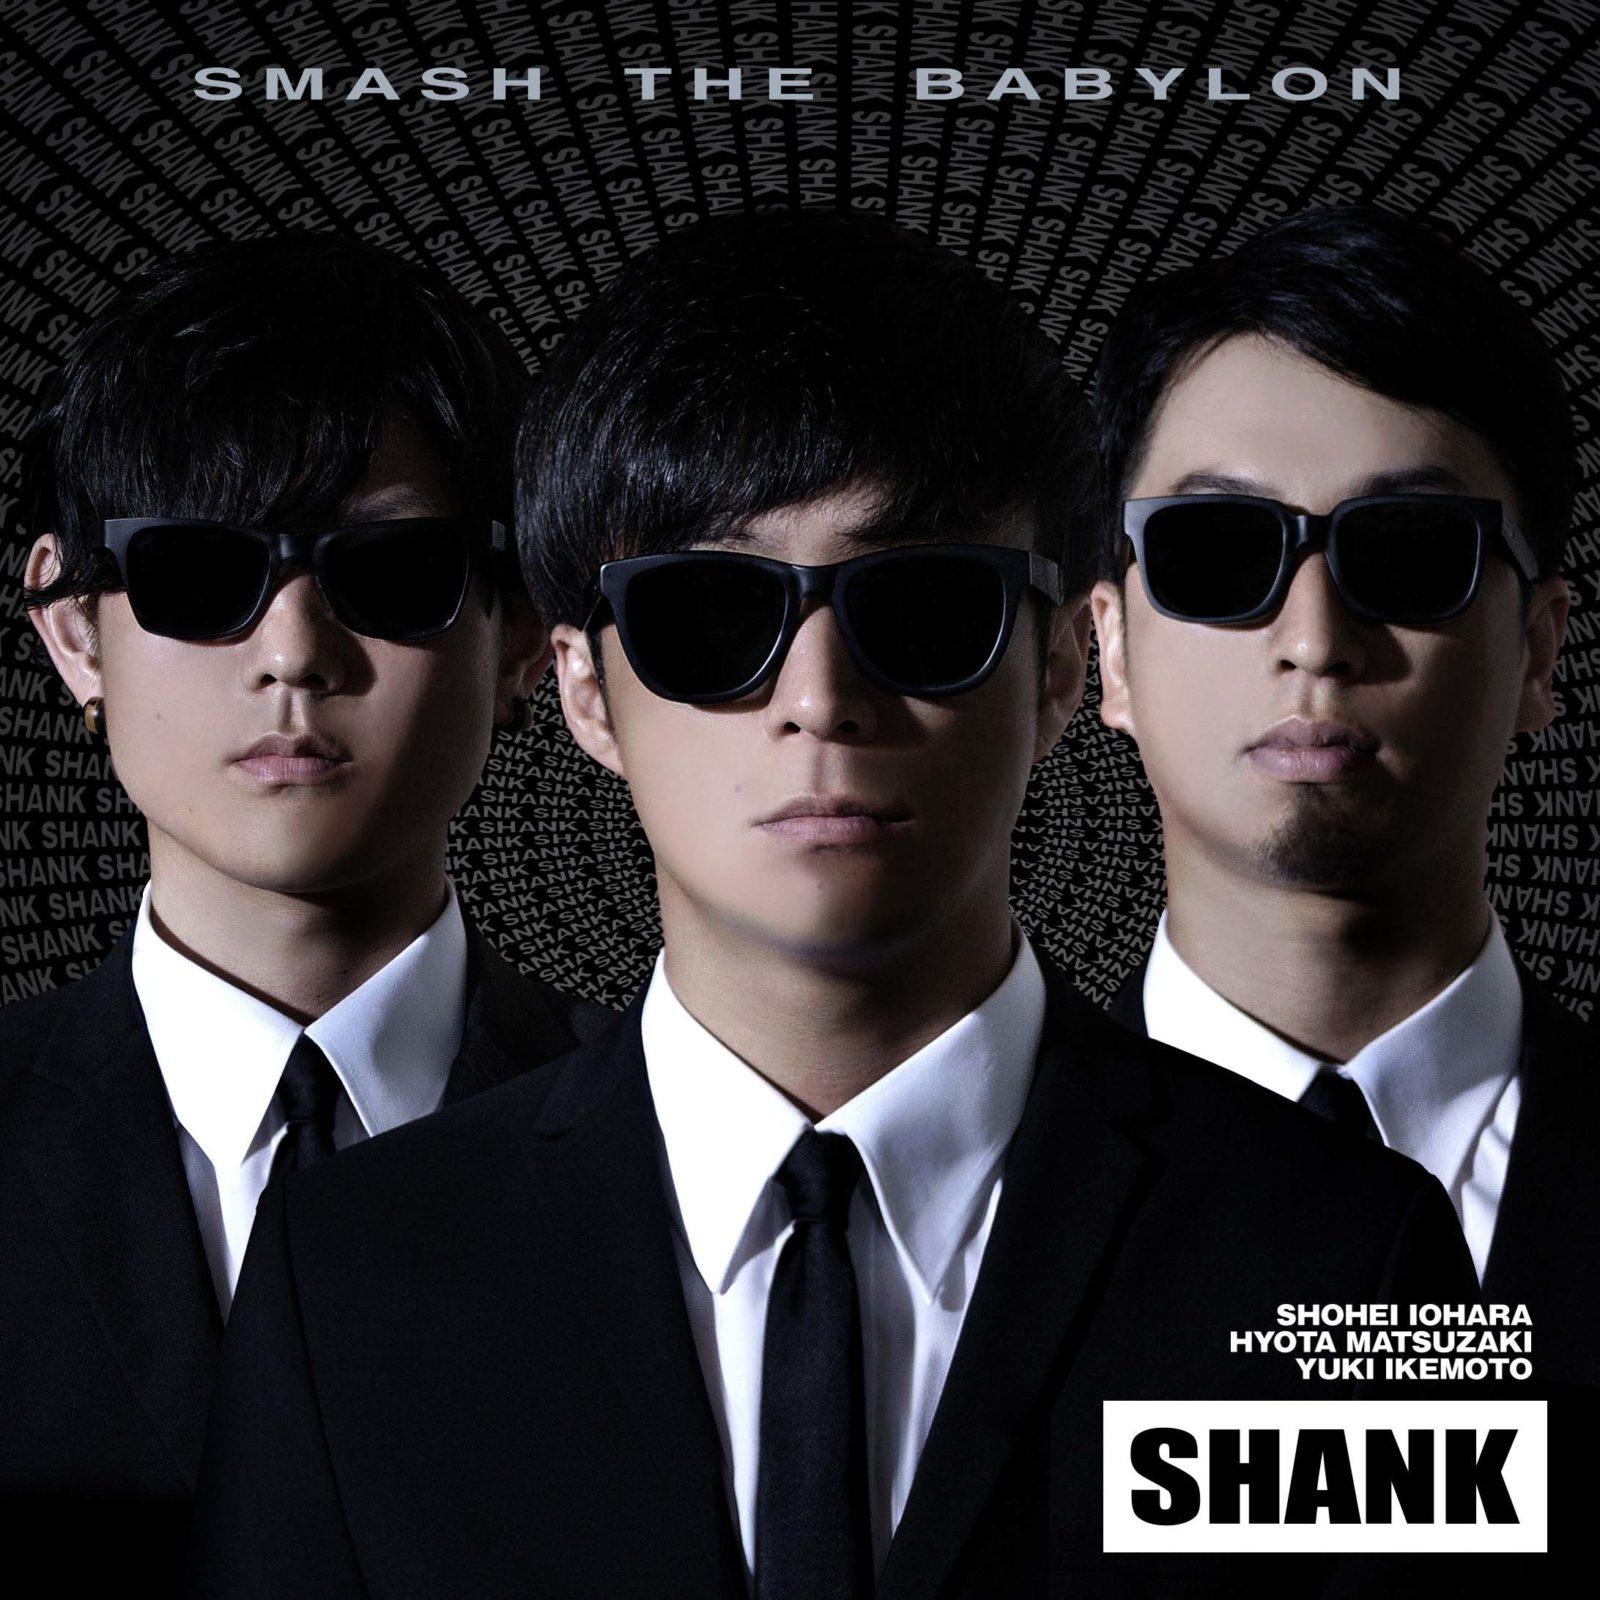 SHANK、初の配信限定シングル「Rising Down」リリースサムネイル画像